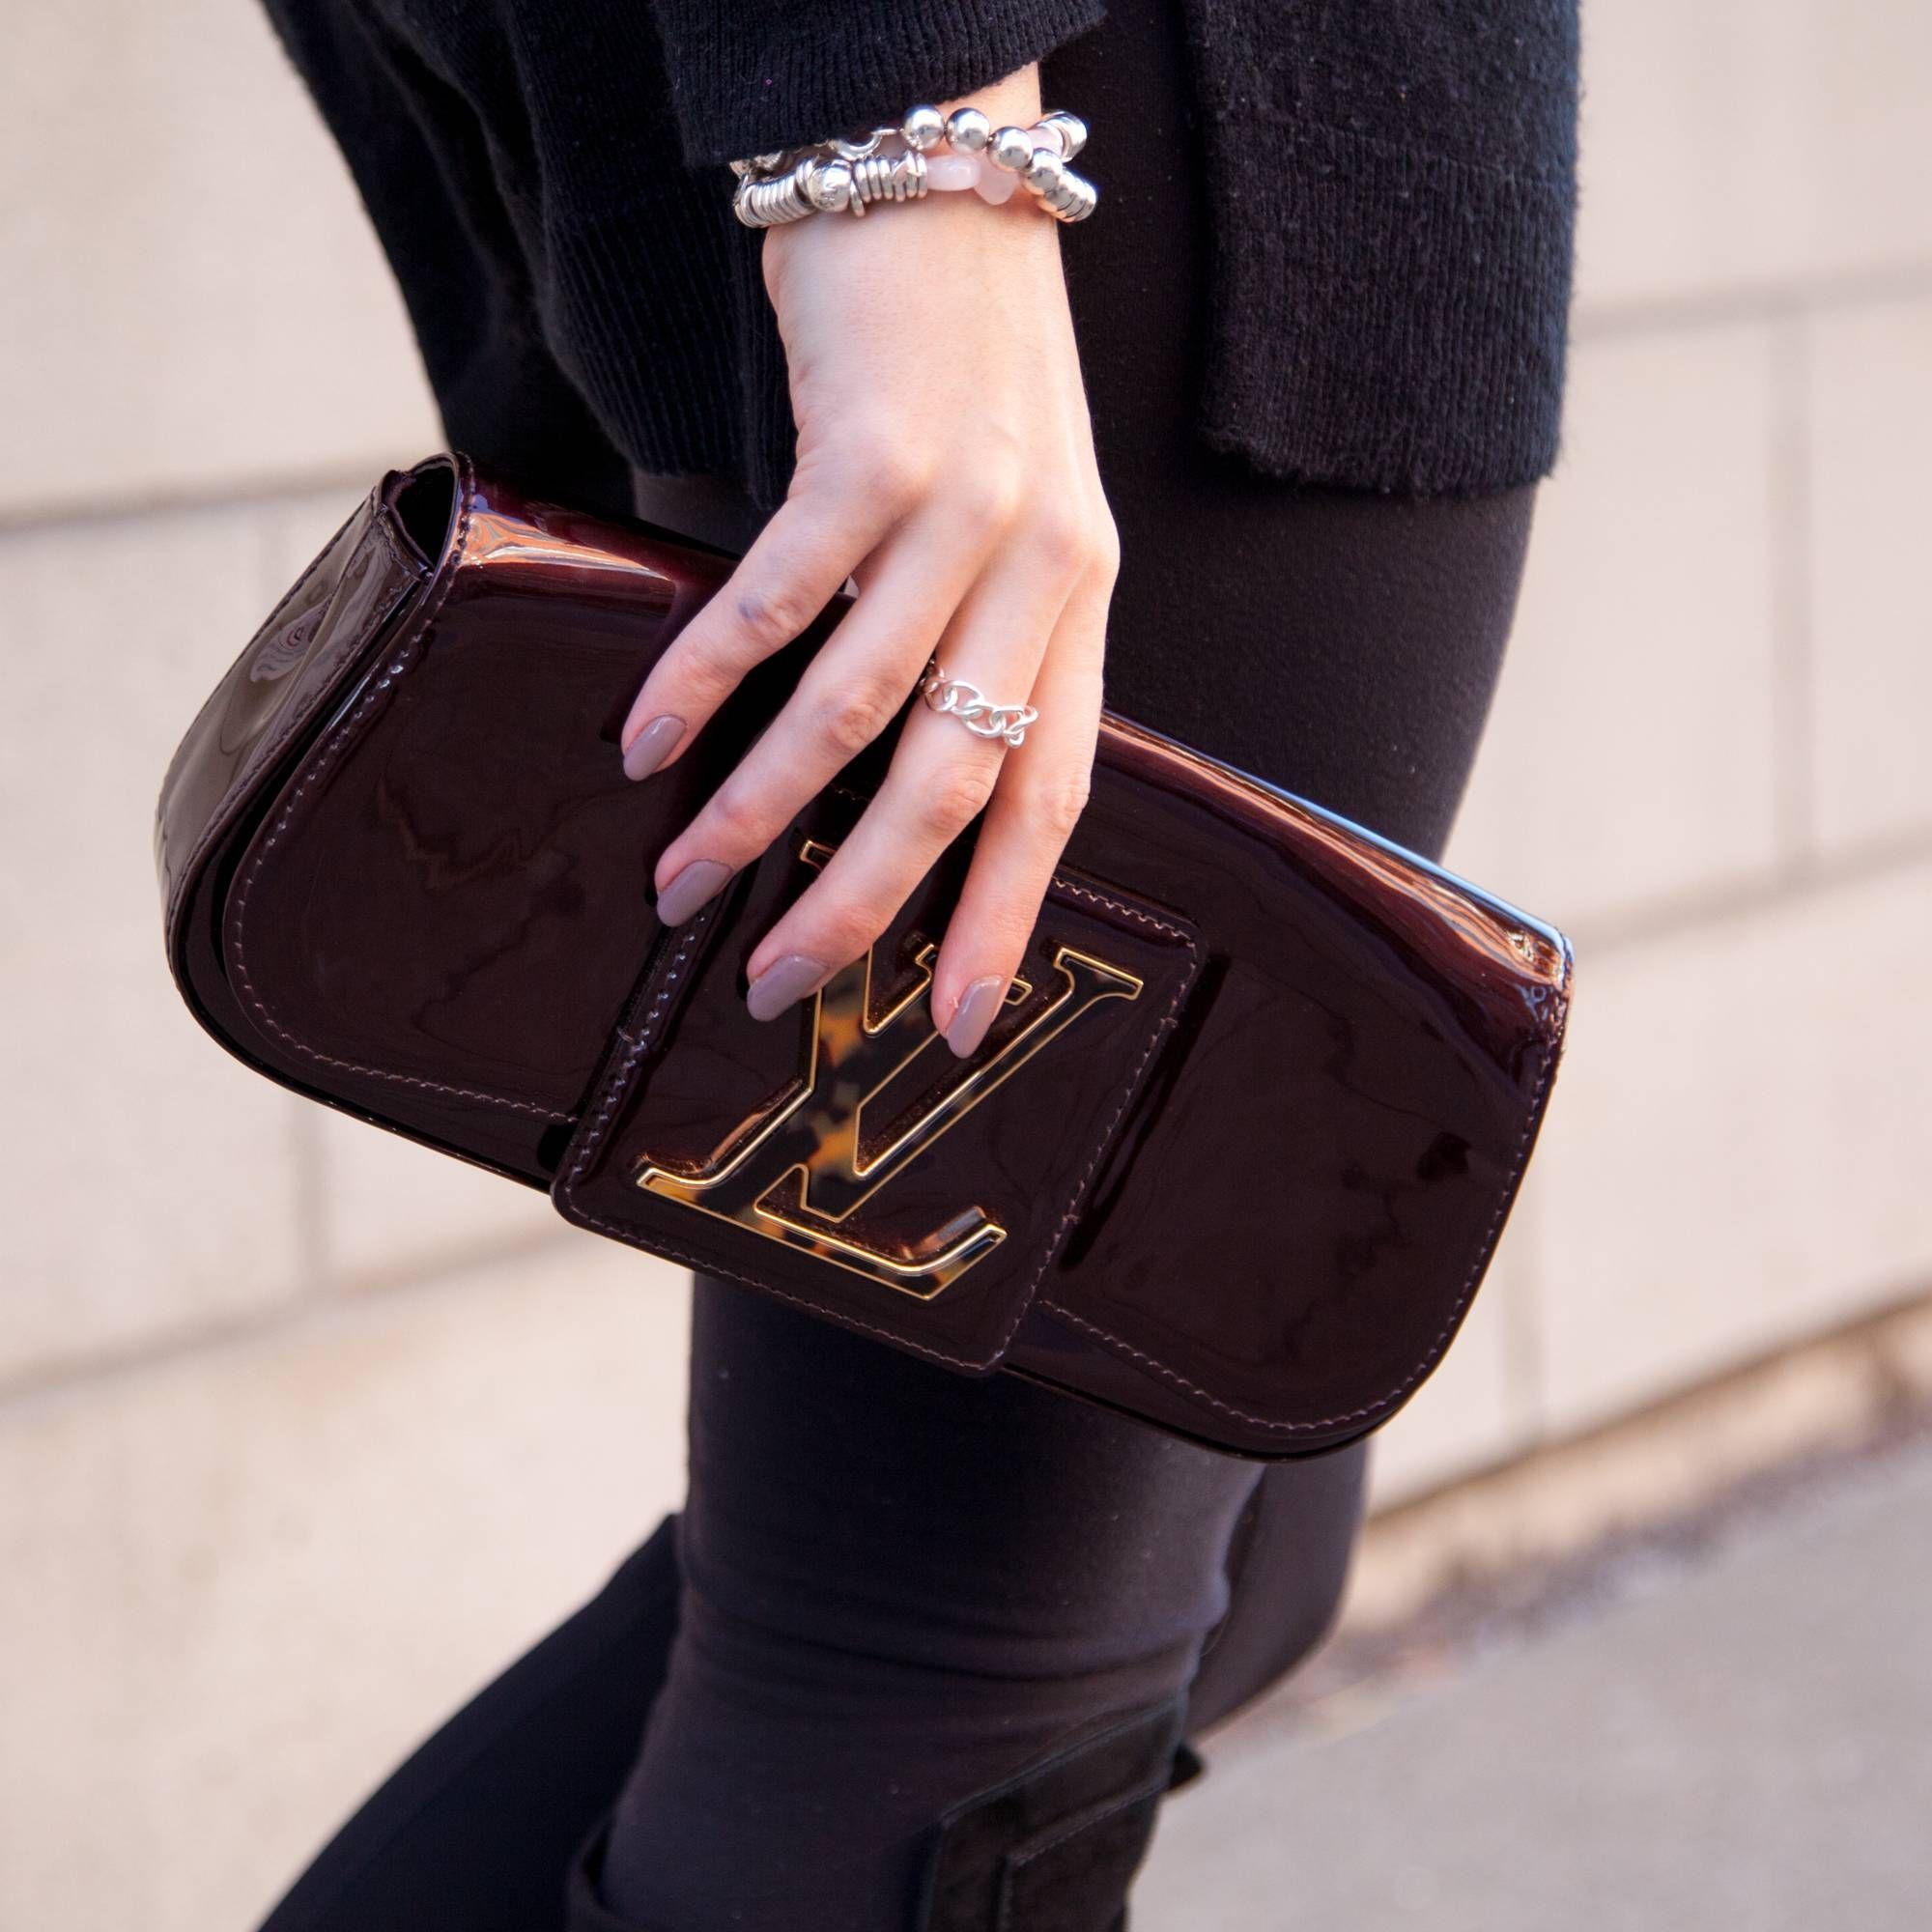 61cb31fad1e0 Louis Vuitton Sobe Clutch